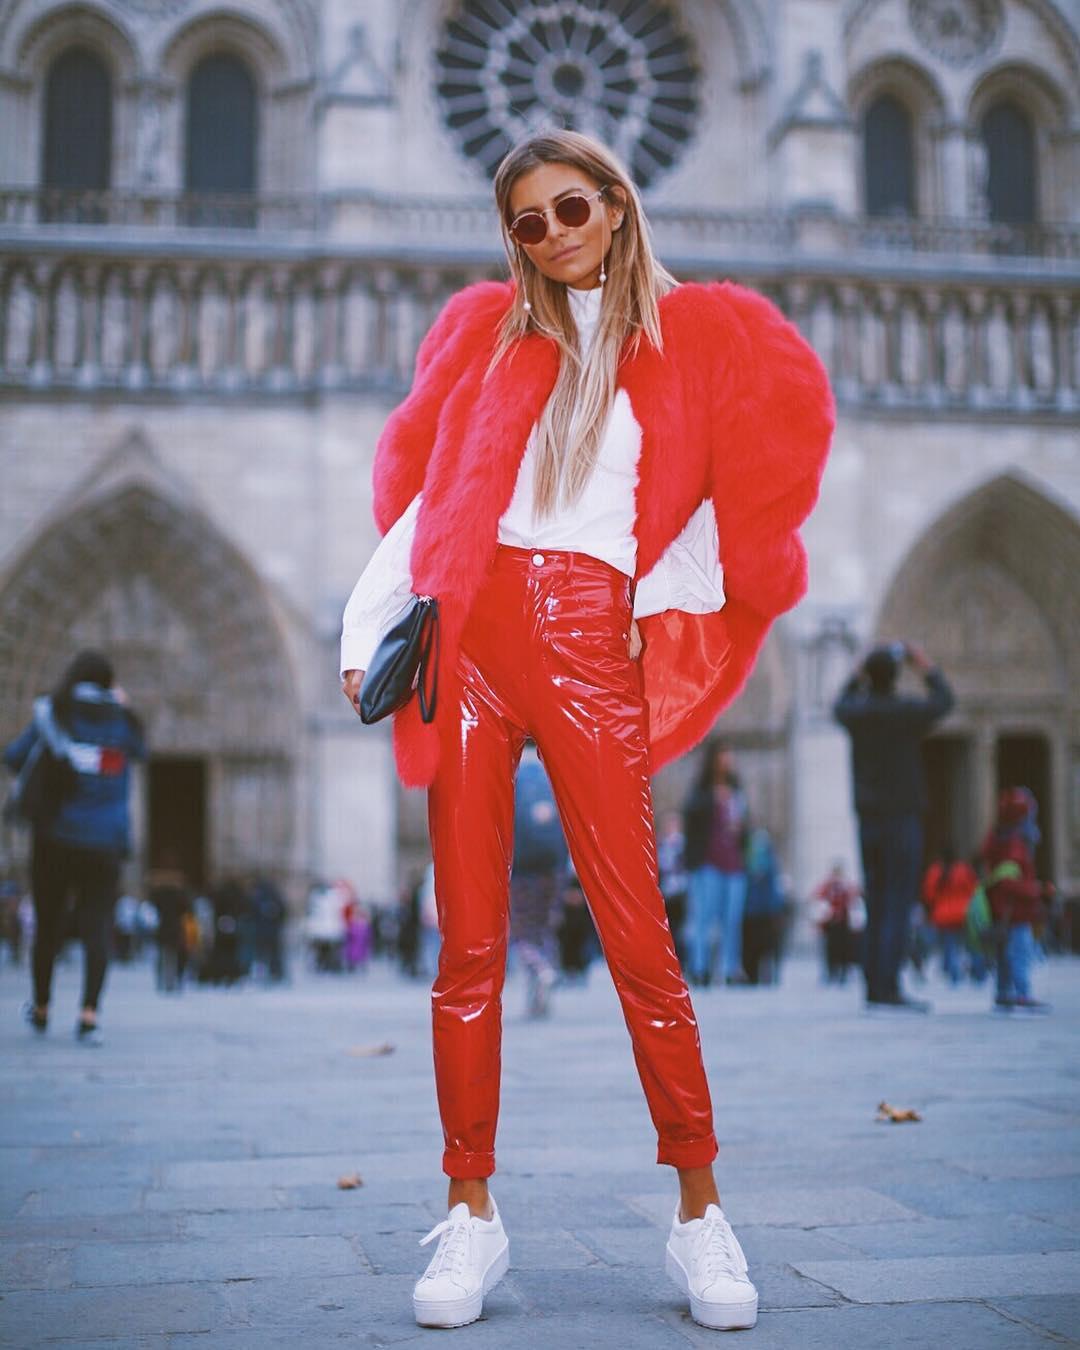 Фэшн-блоггер с амбициями: уличная мода в стиле Адрианы ГоЛима